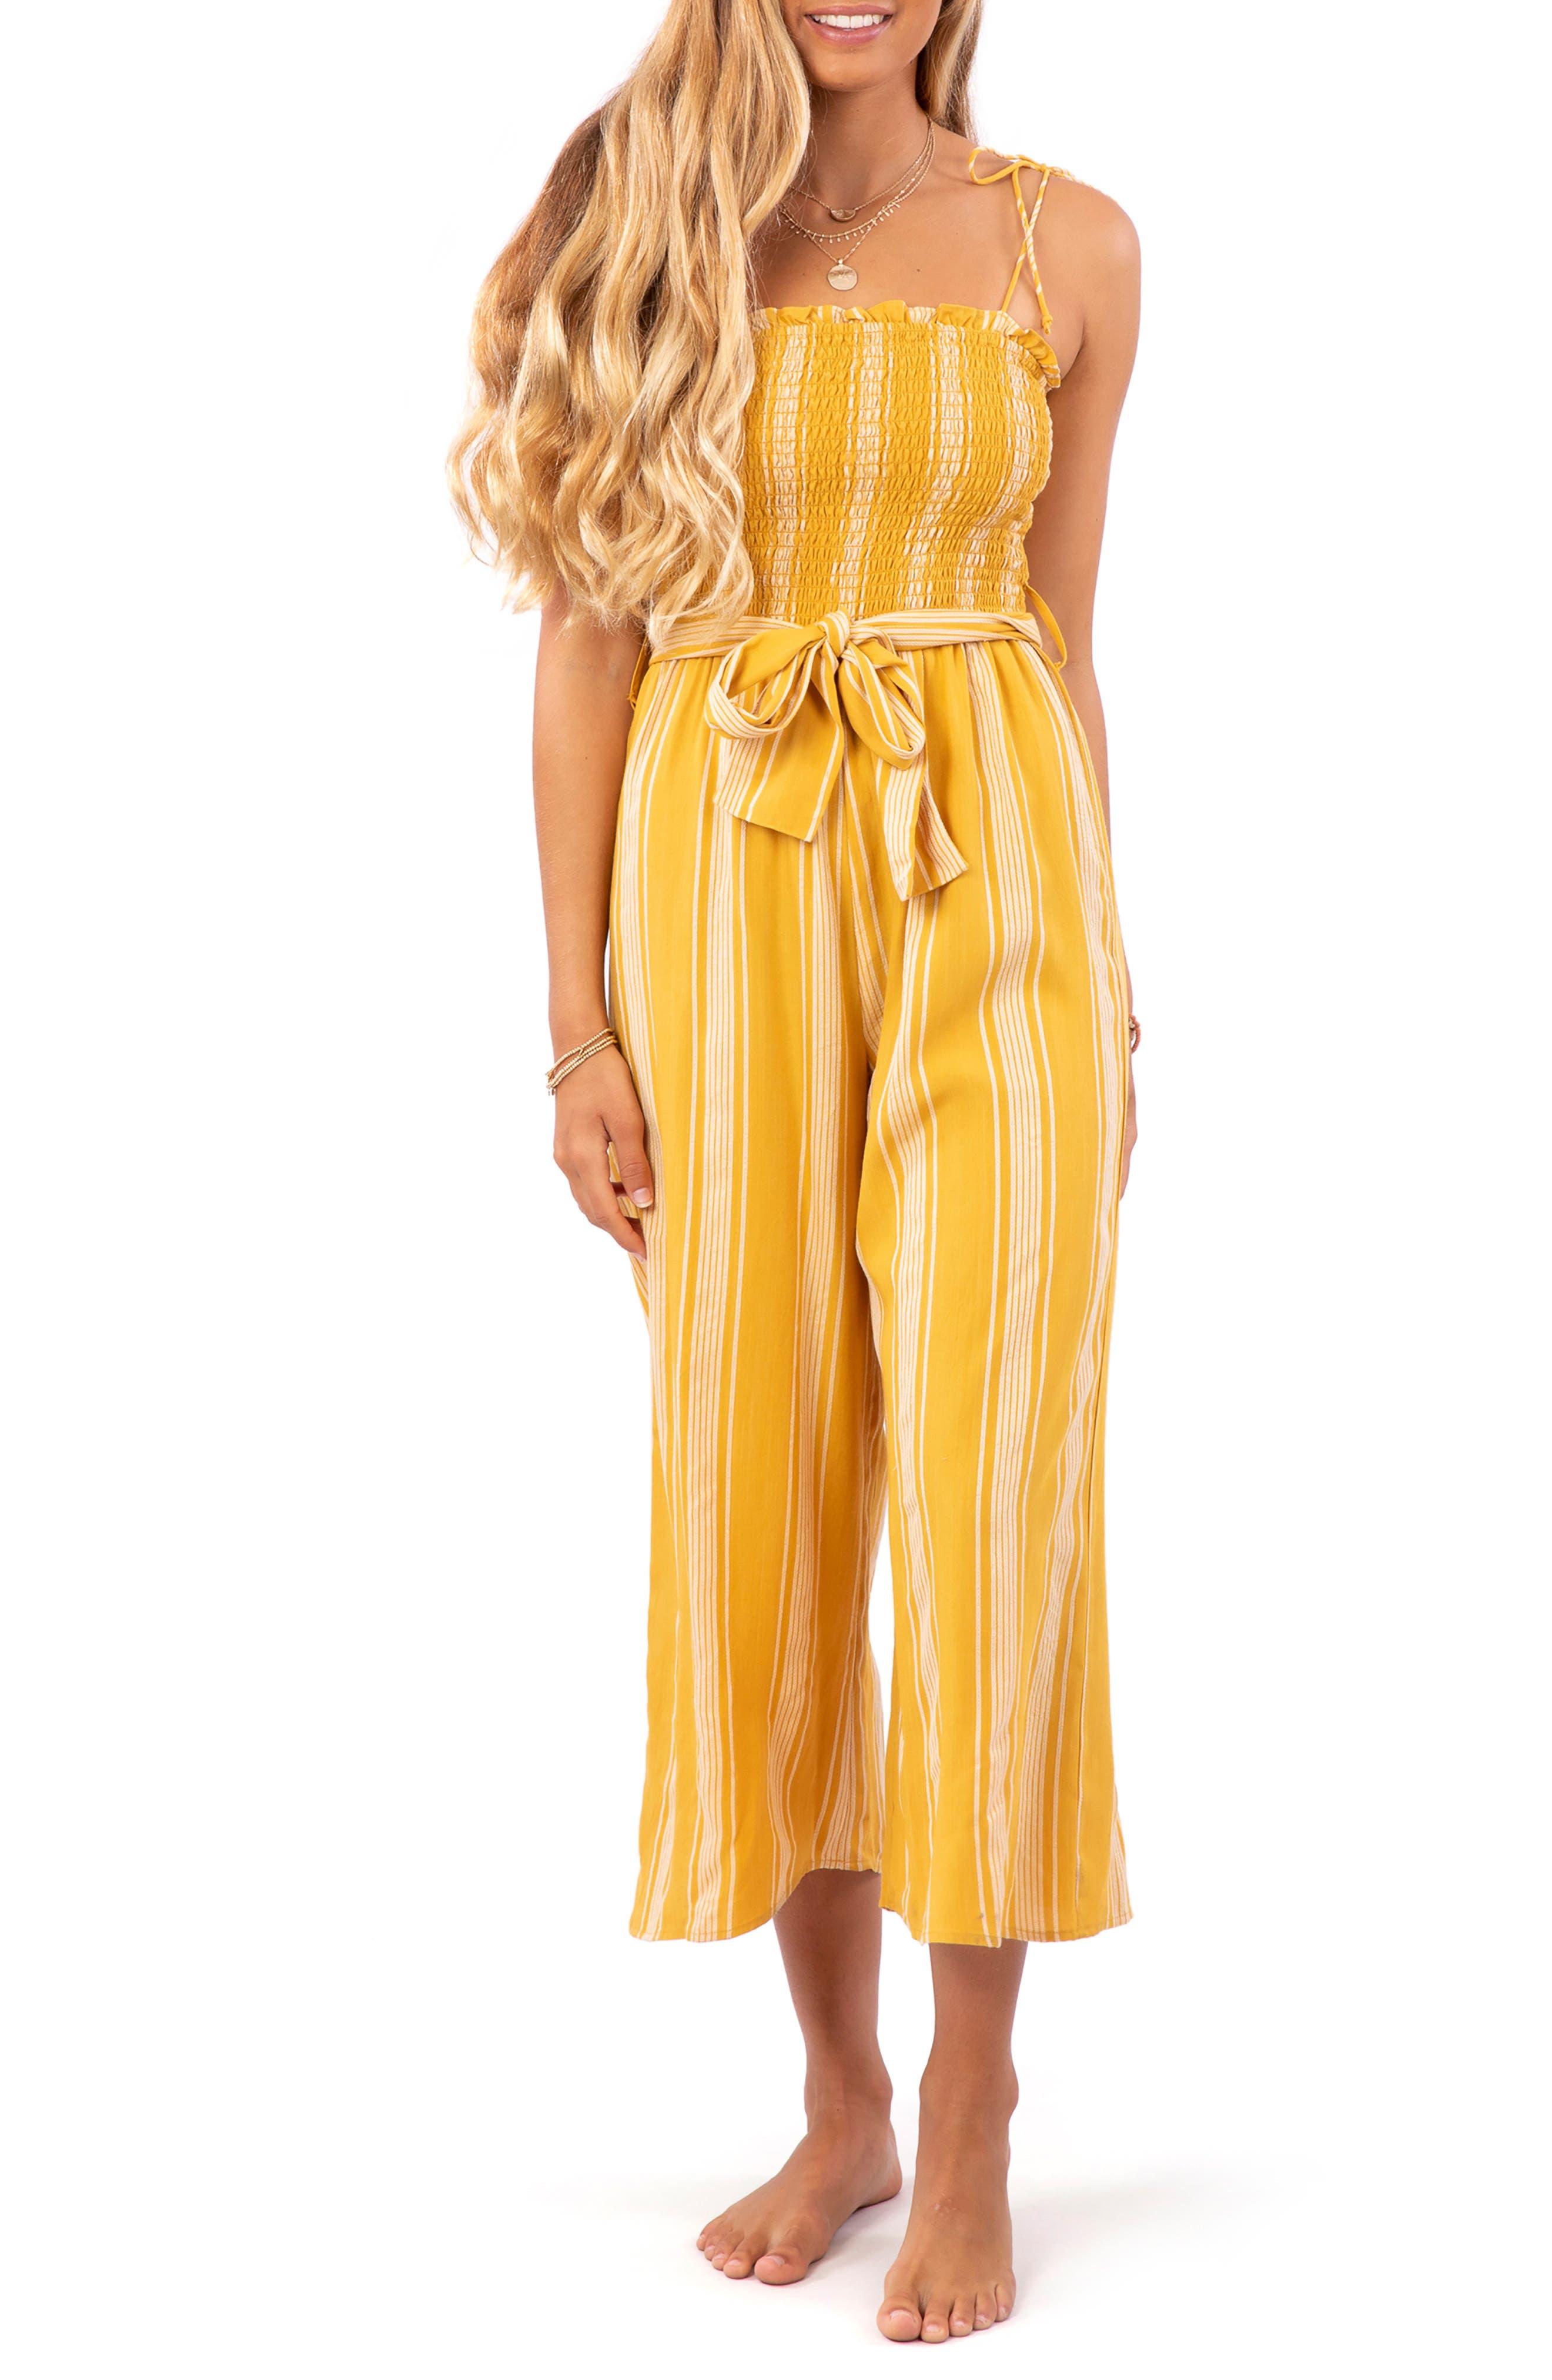 boho playsuit Jumpsuit for women Linen romper women Women/'s overalls Women/'s romper Hippie Jumpsuit Yellow Jumpsuit Women/'s Jumpsuit